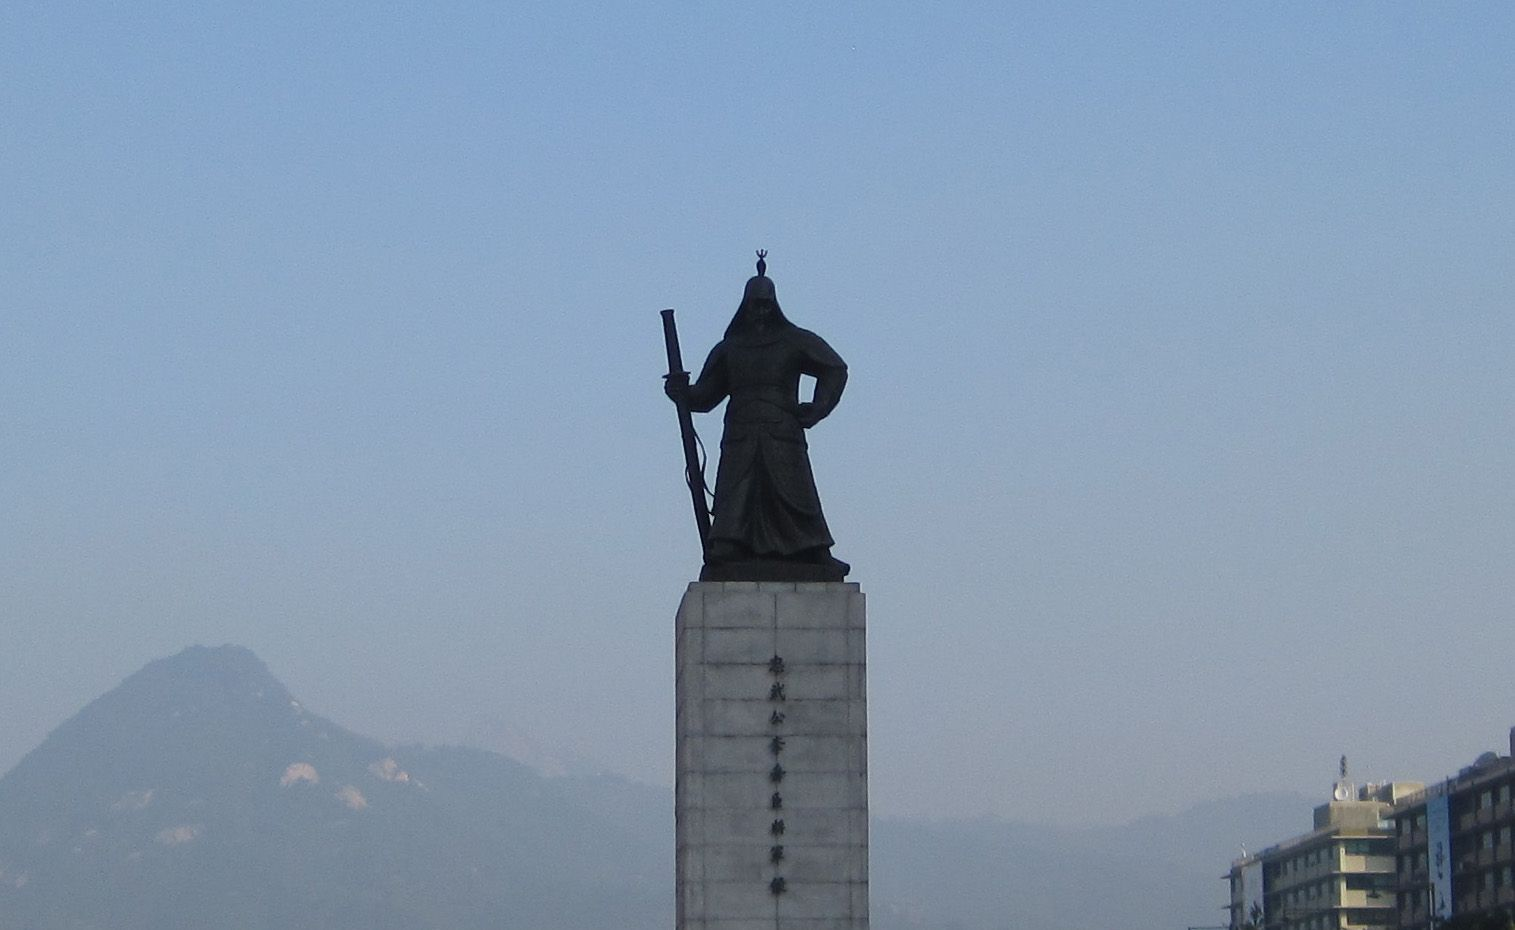 Seoul 서울 , South Korea 대한민국, 大韓民國, City Center